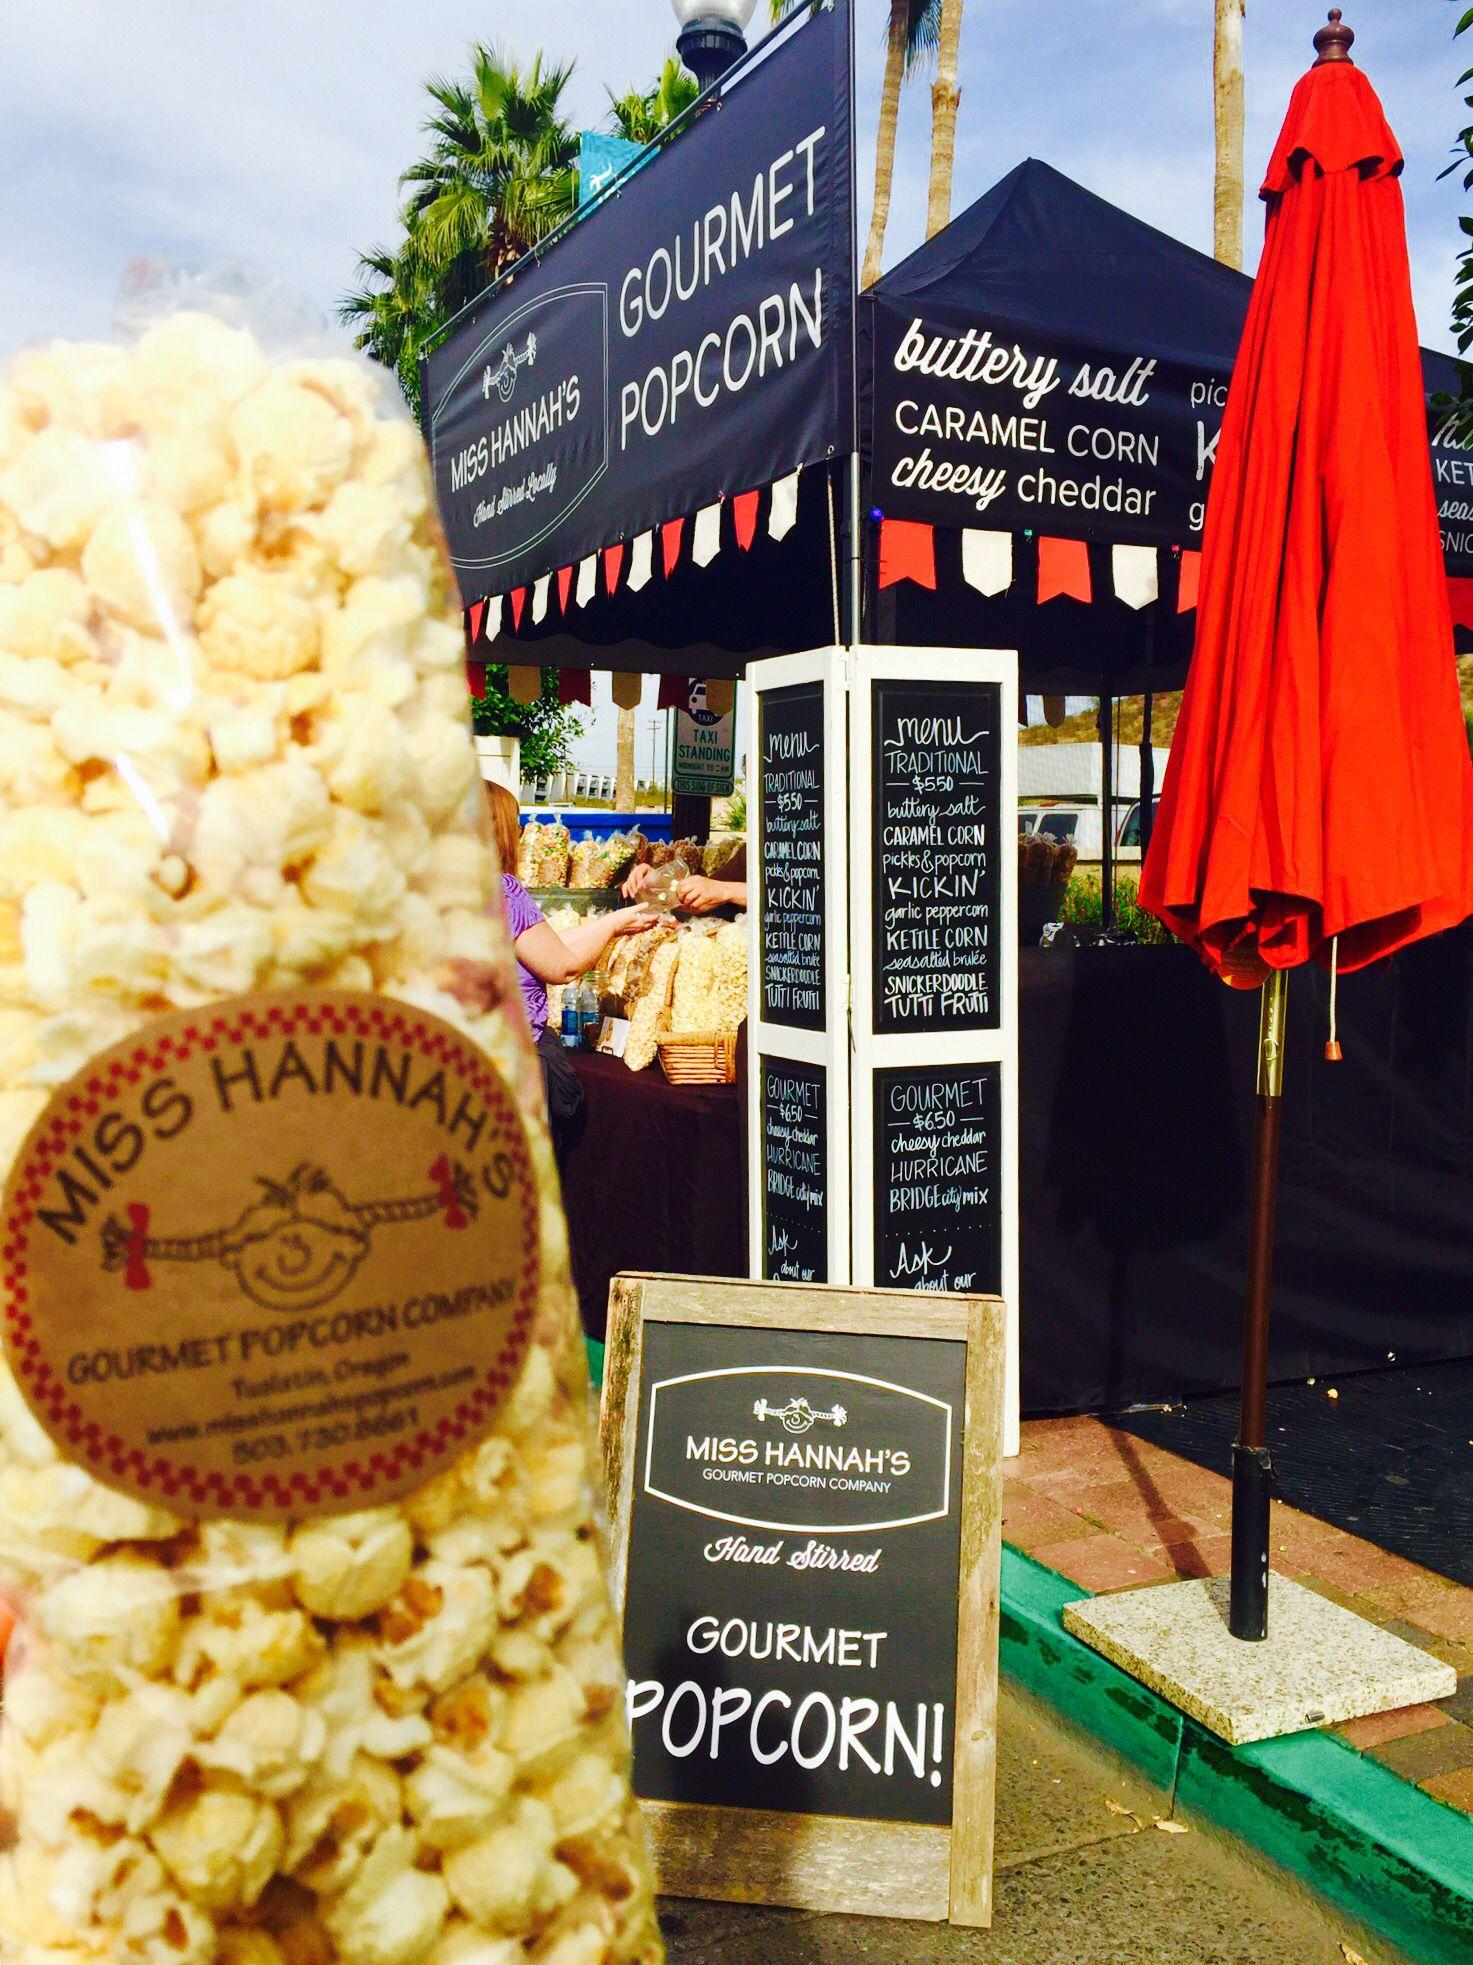 New look Miss Hannah's Gourmet Popcorn Co.